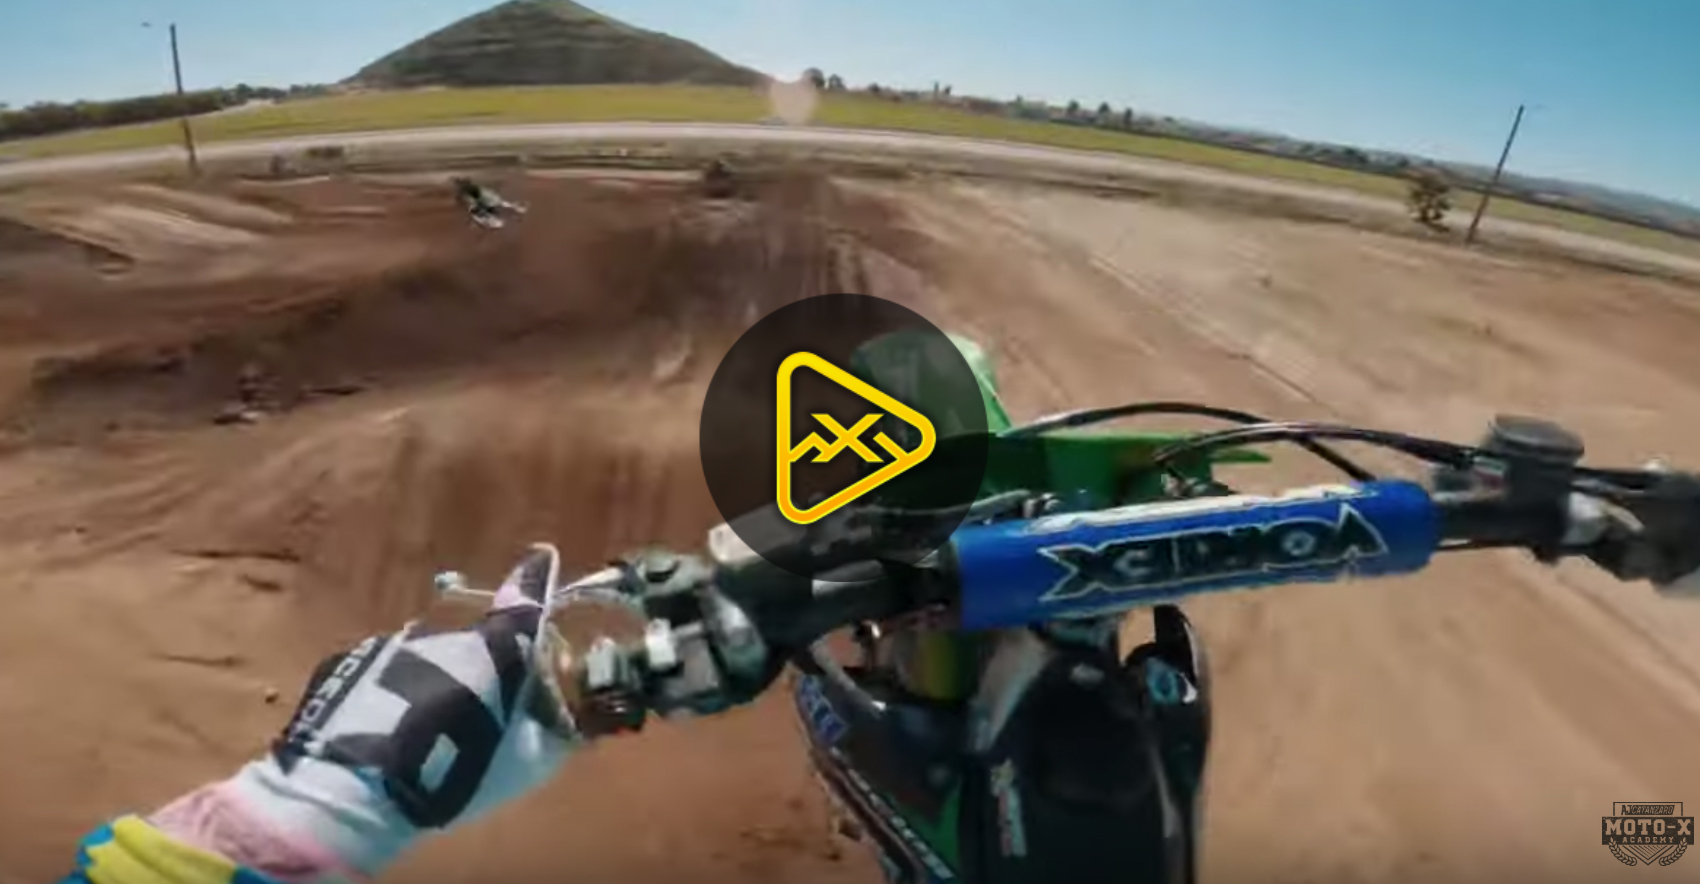 Helmet Cam: 2 laps with AJ at State Fair SX